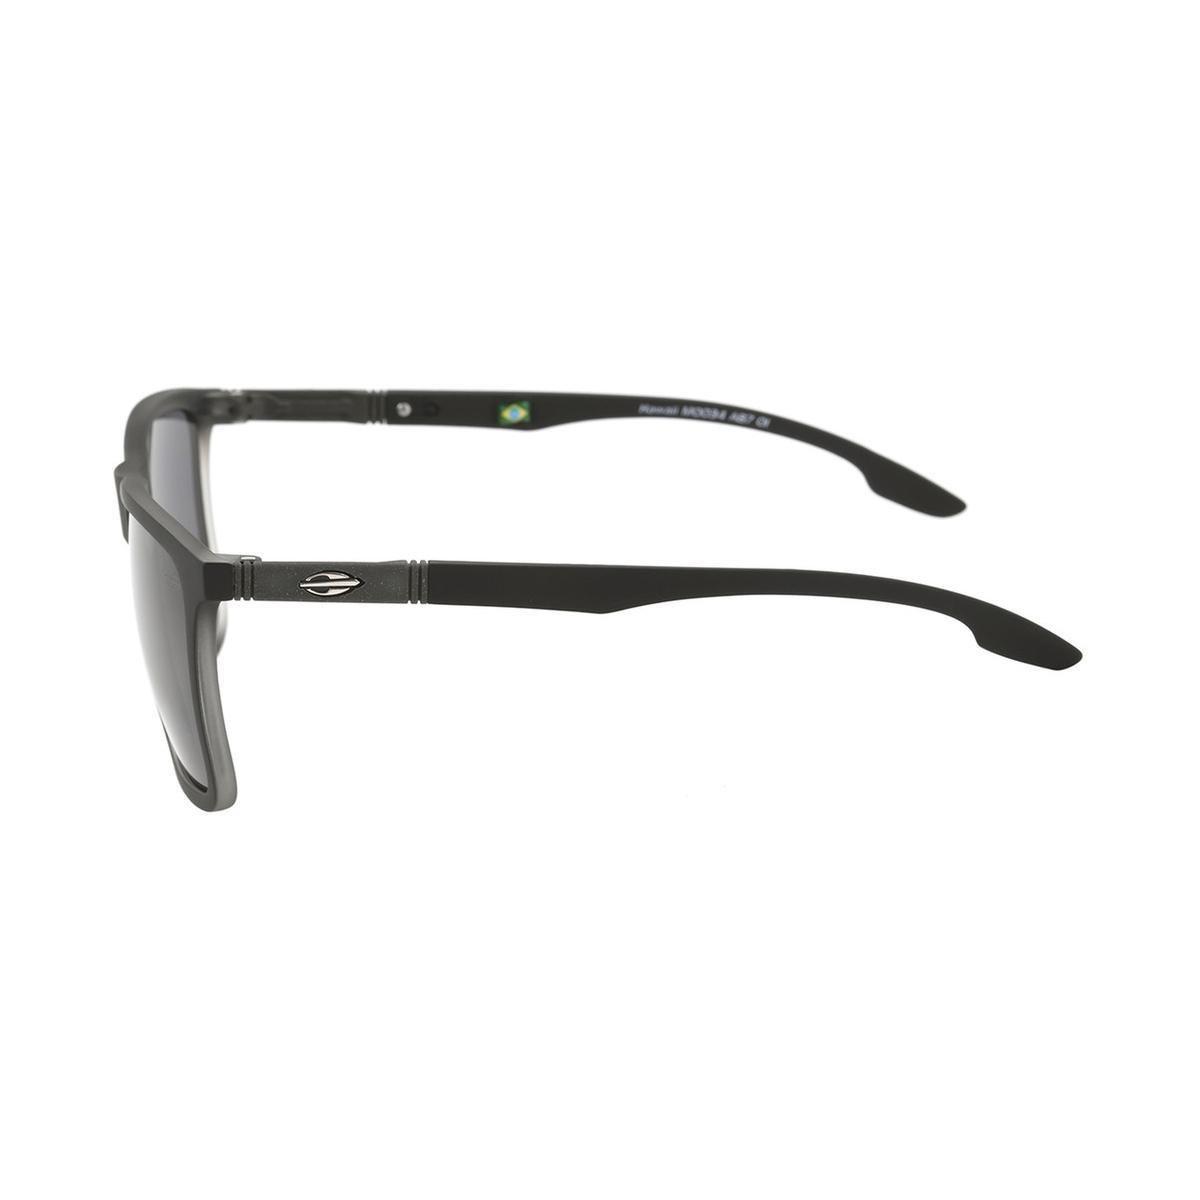 9f1bdfd4cb335 Óculos Mormaii Hawaii - Preto - Compre Agora   Netshoes